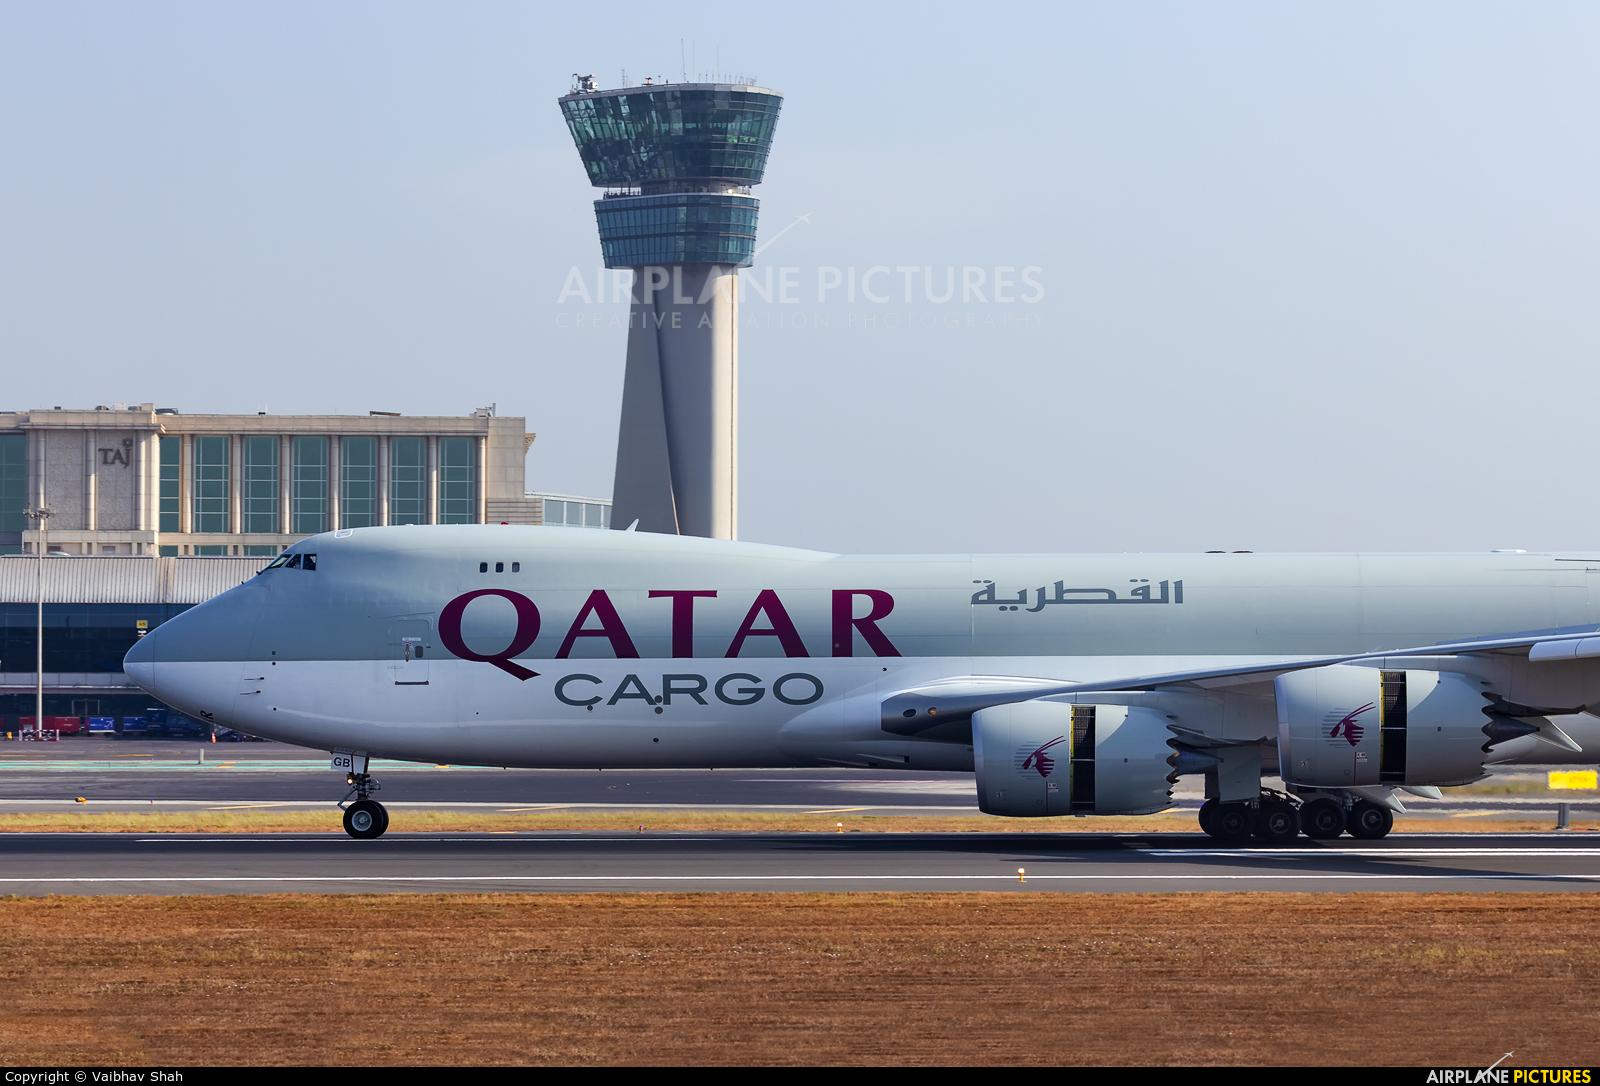 Qatar Airways Cargo A7-BGB aircraft at Mumbai - Chhatrapati Shivaji Intl